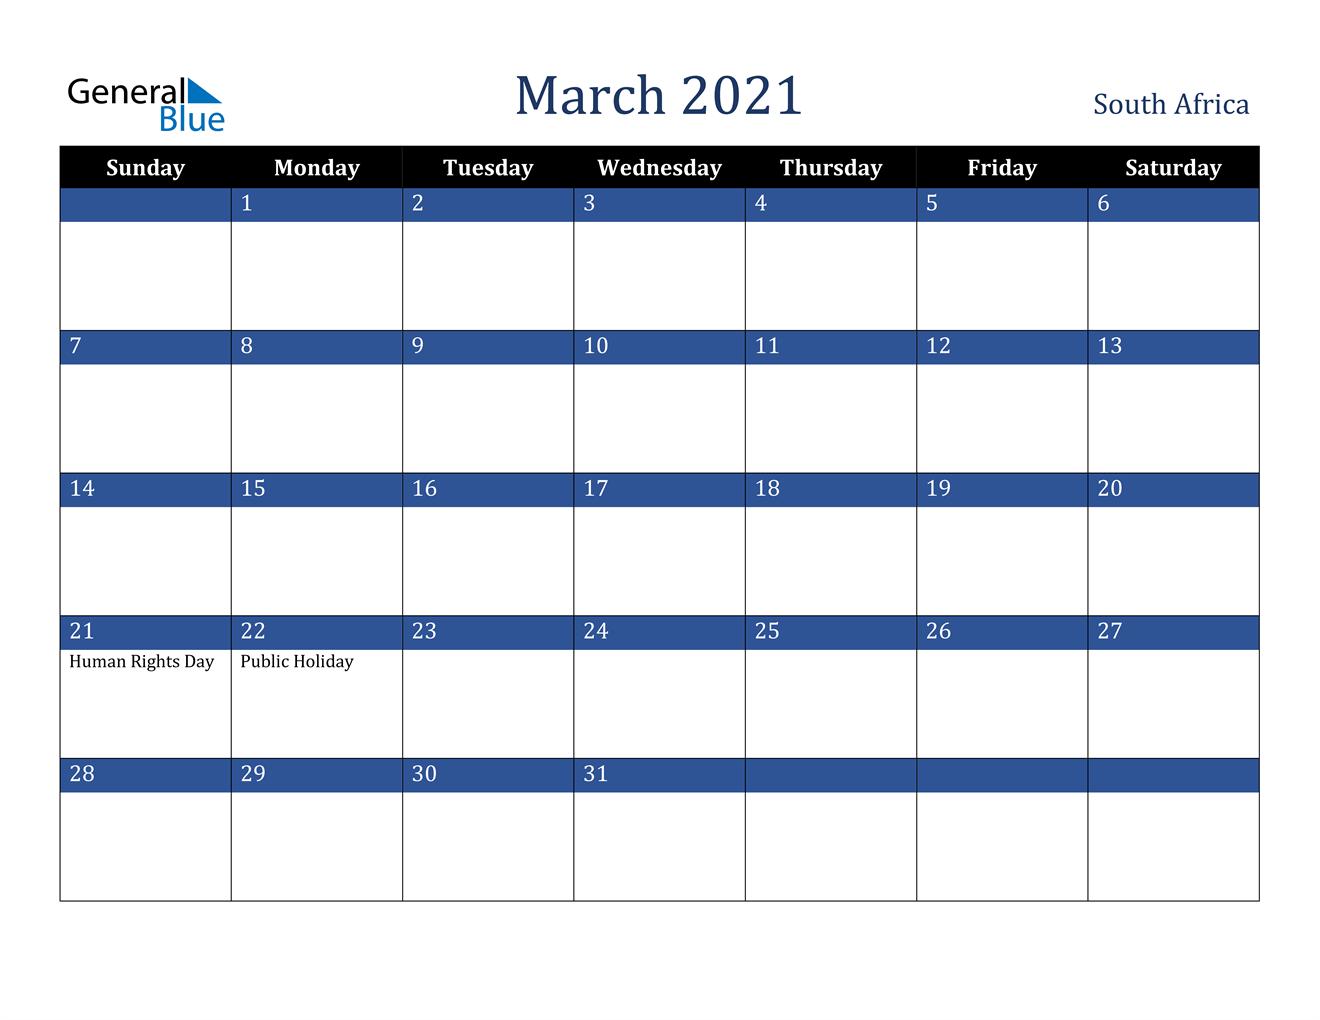 March 2021 Calendar - South Africa